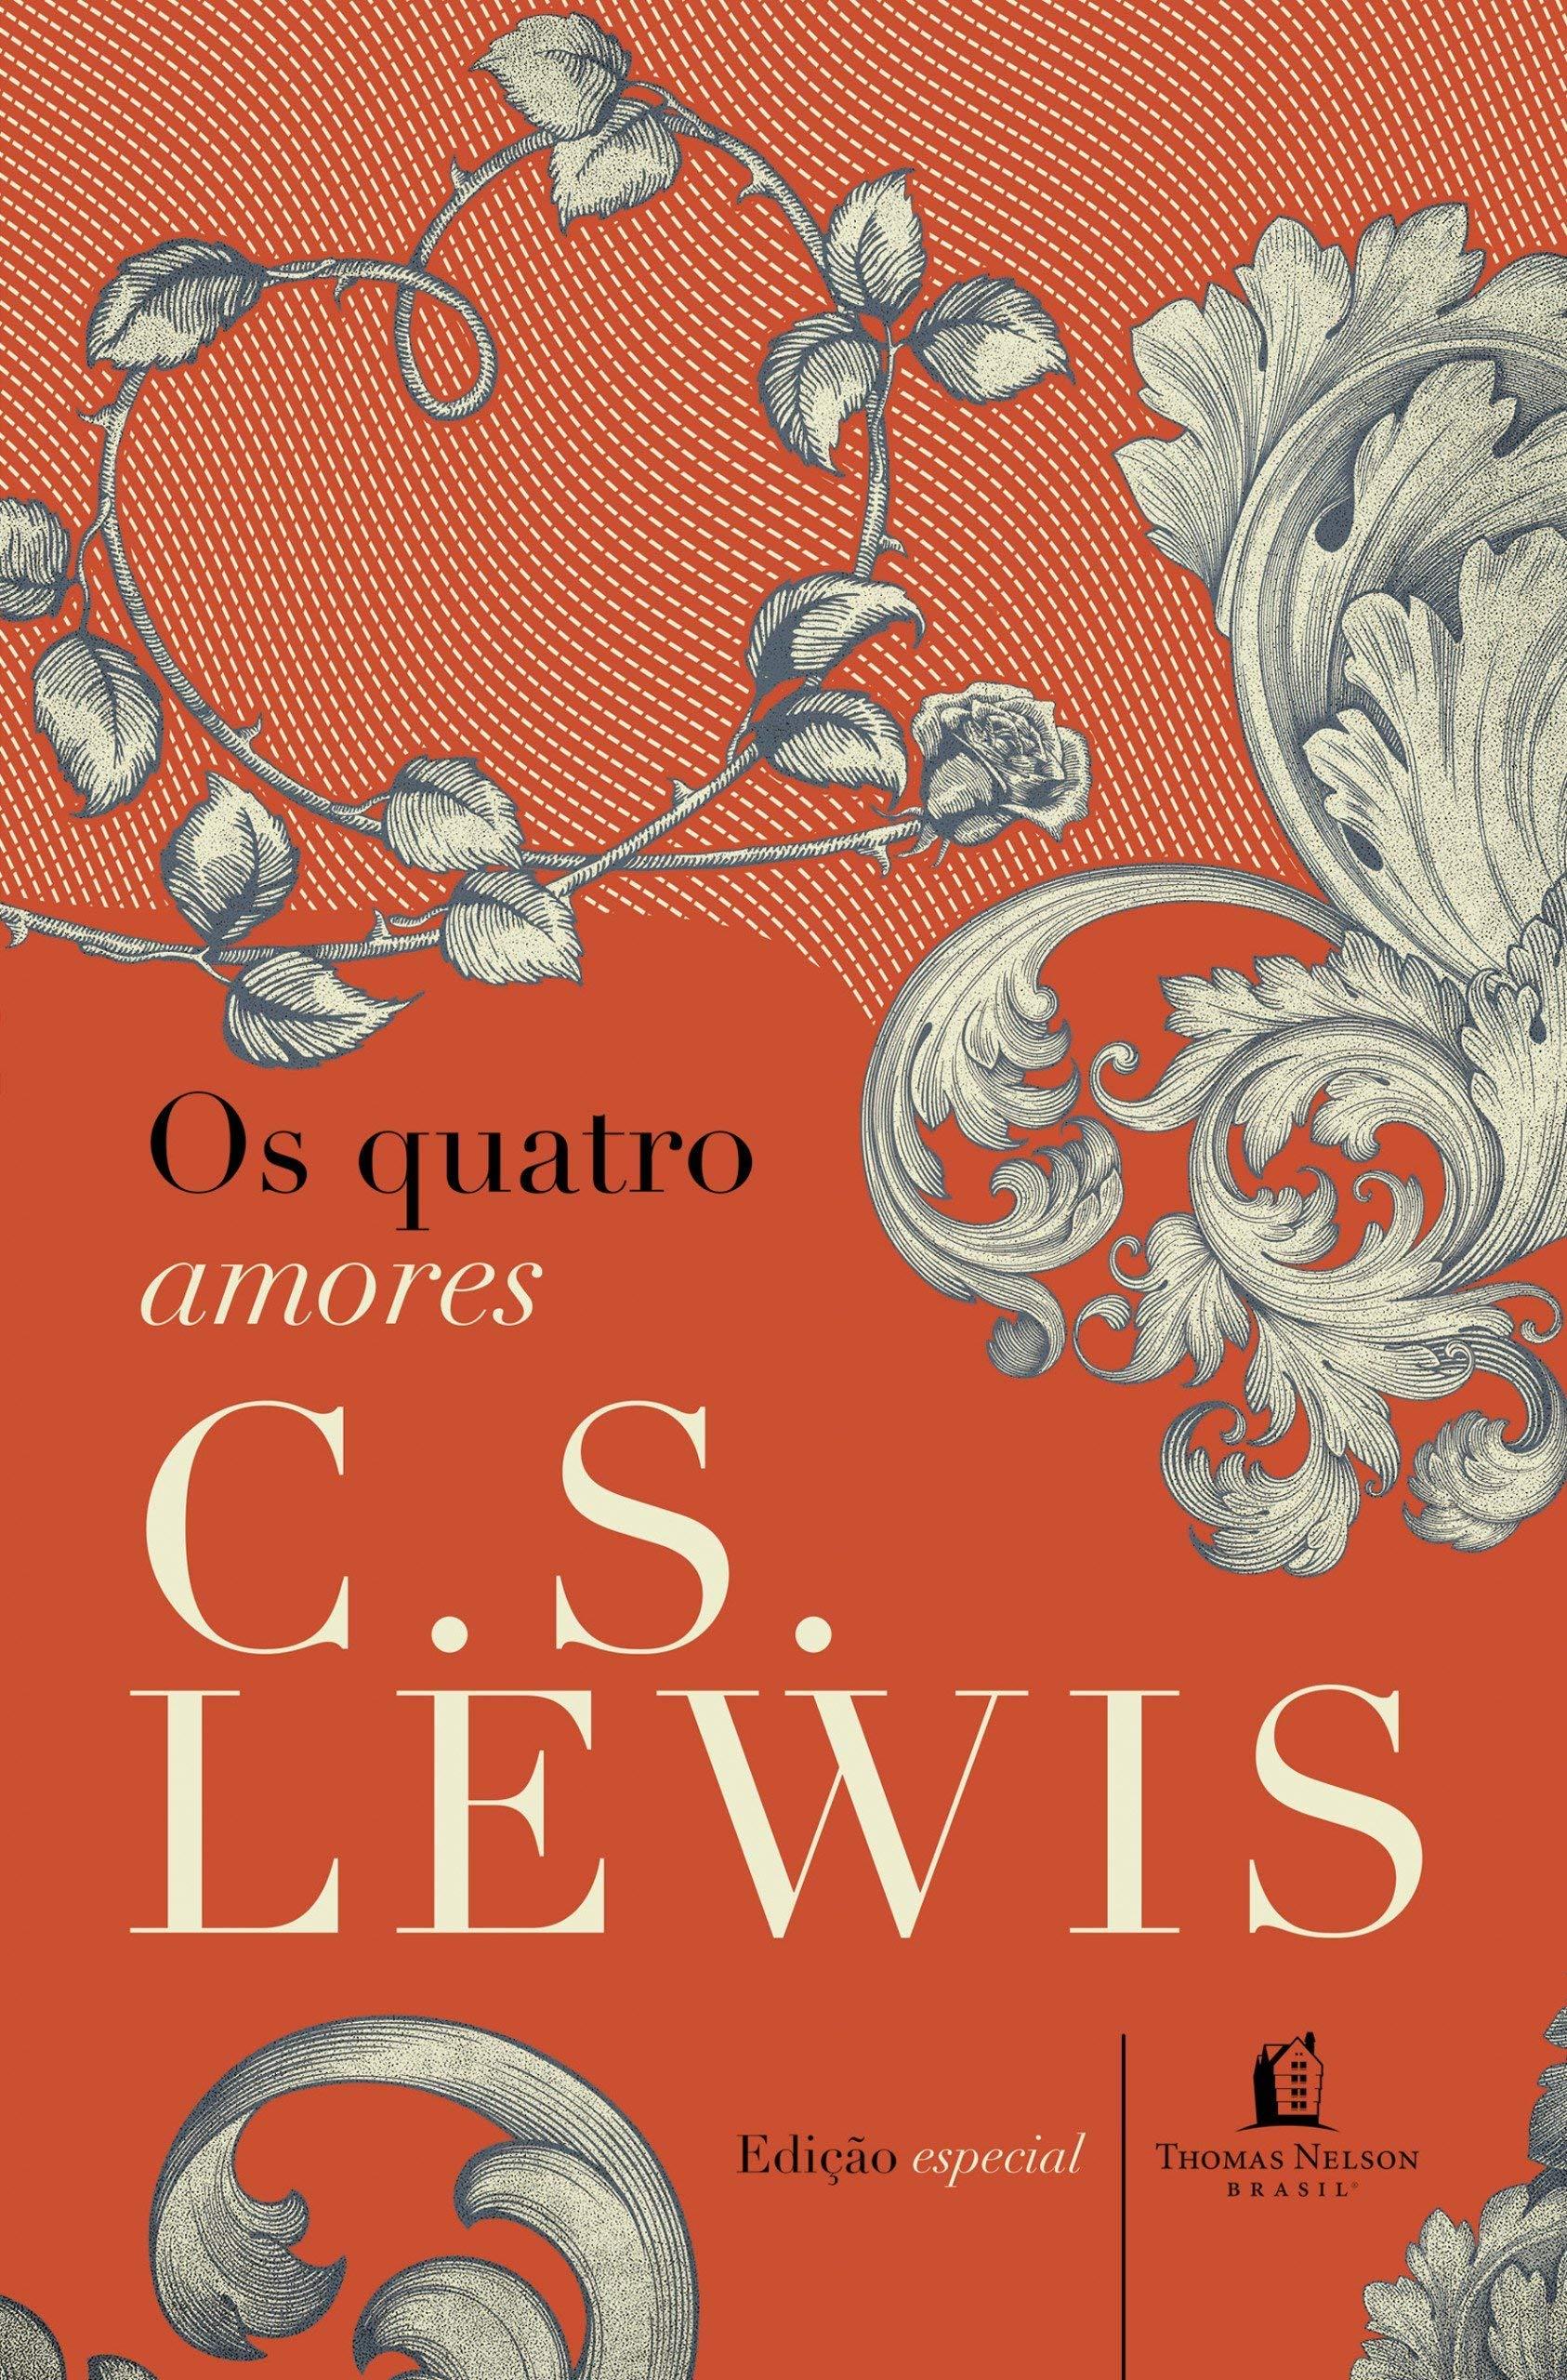 Os quatro amores - 9788578601959 - Livros na Amazon Brasil